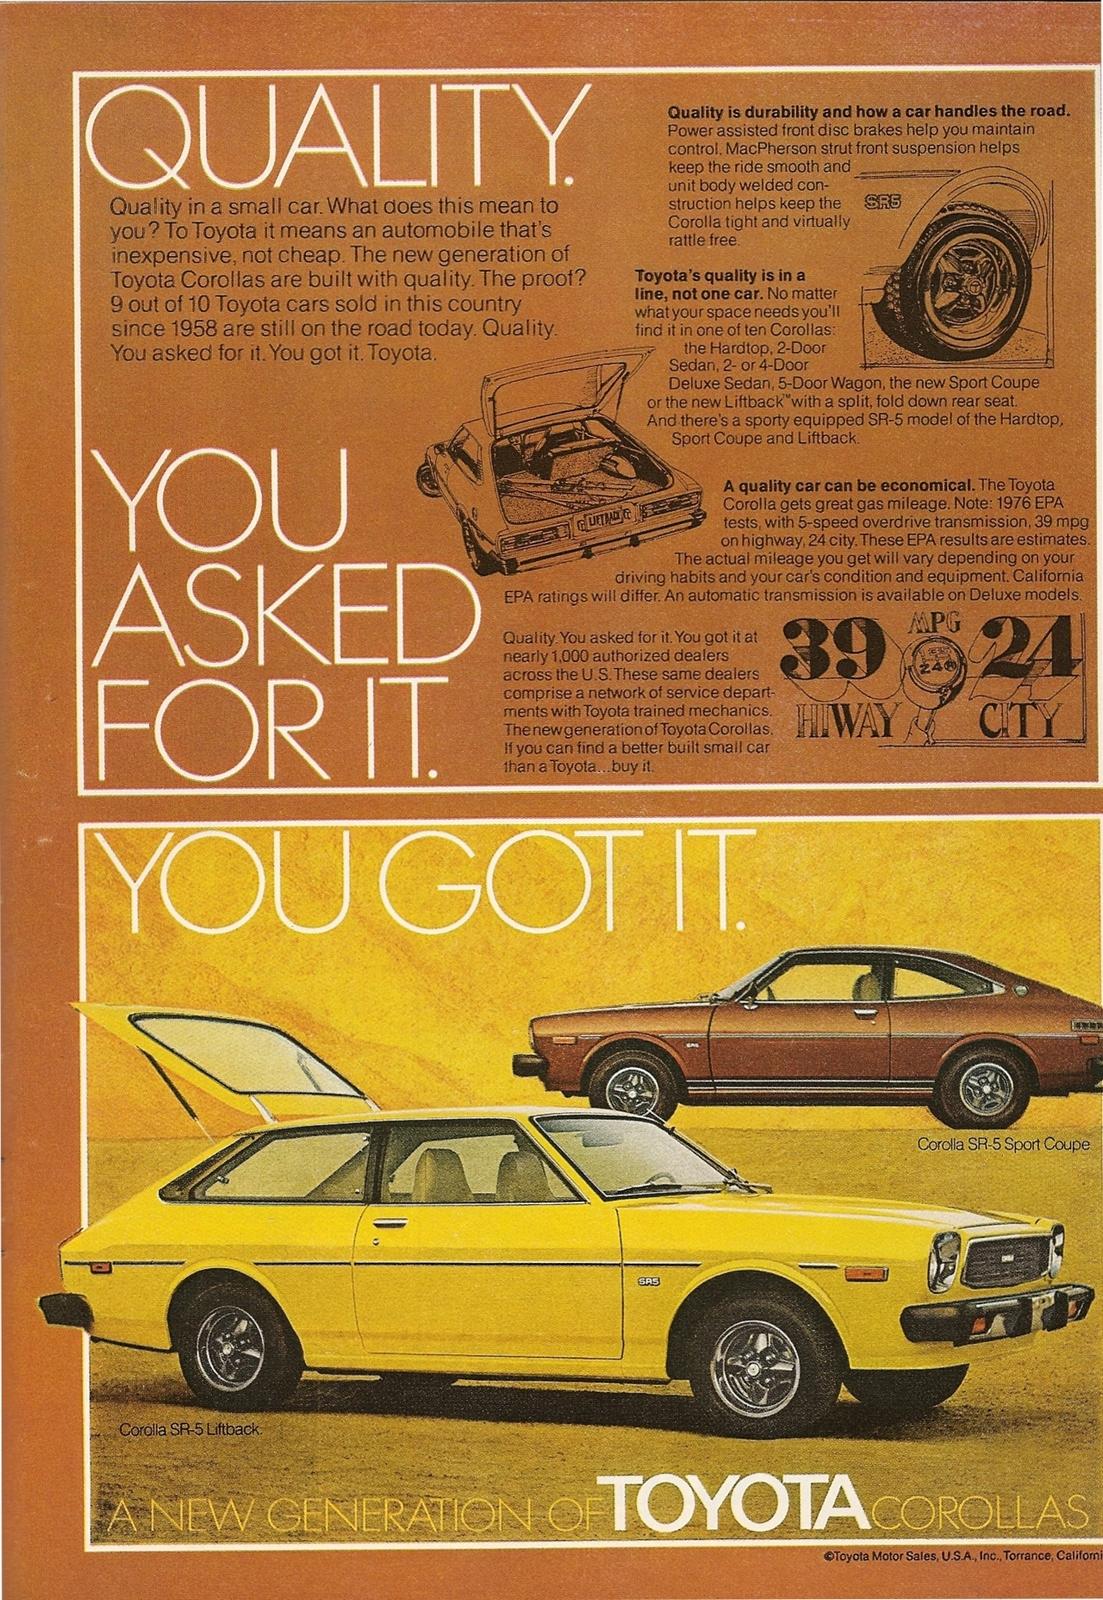 1977-Toyota-Corolla.jpg